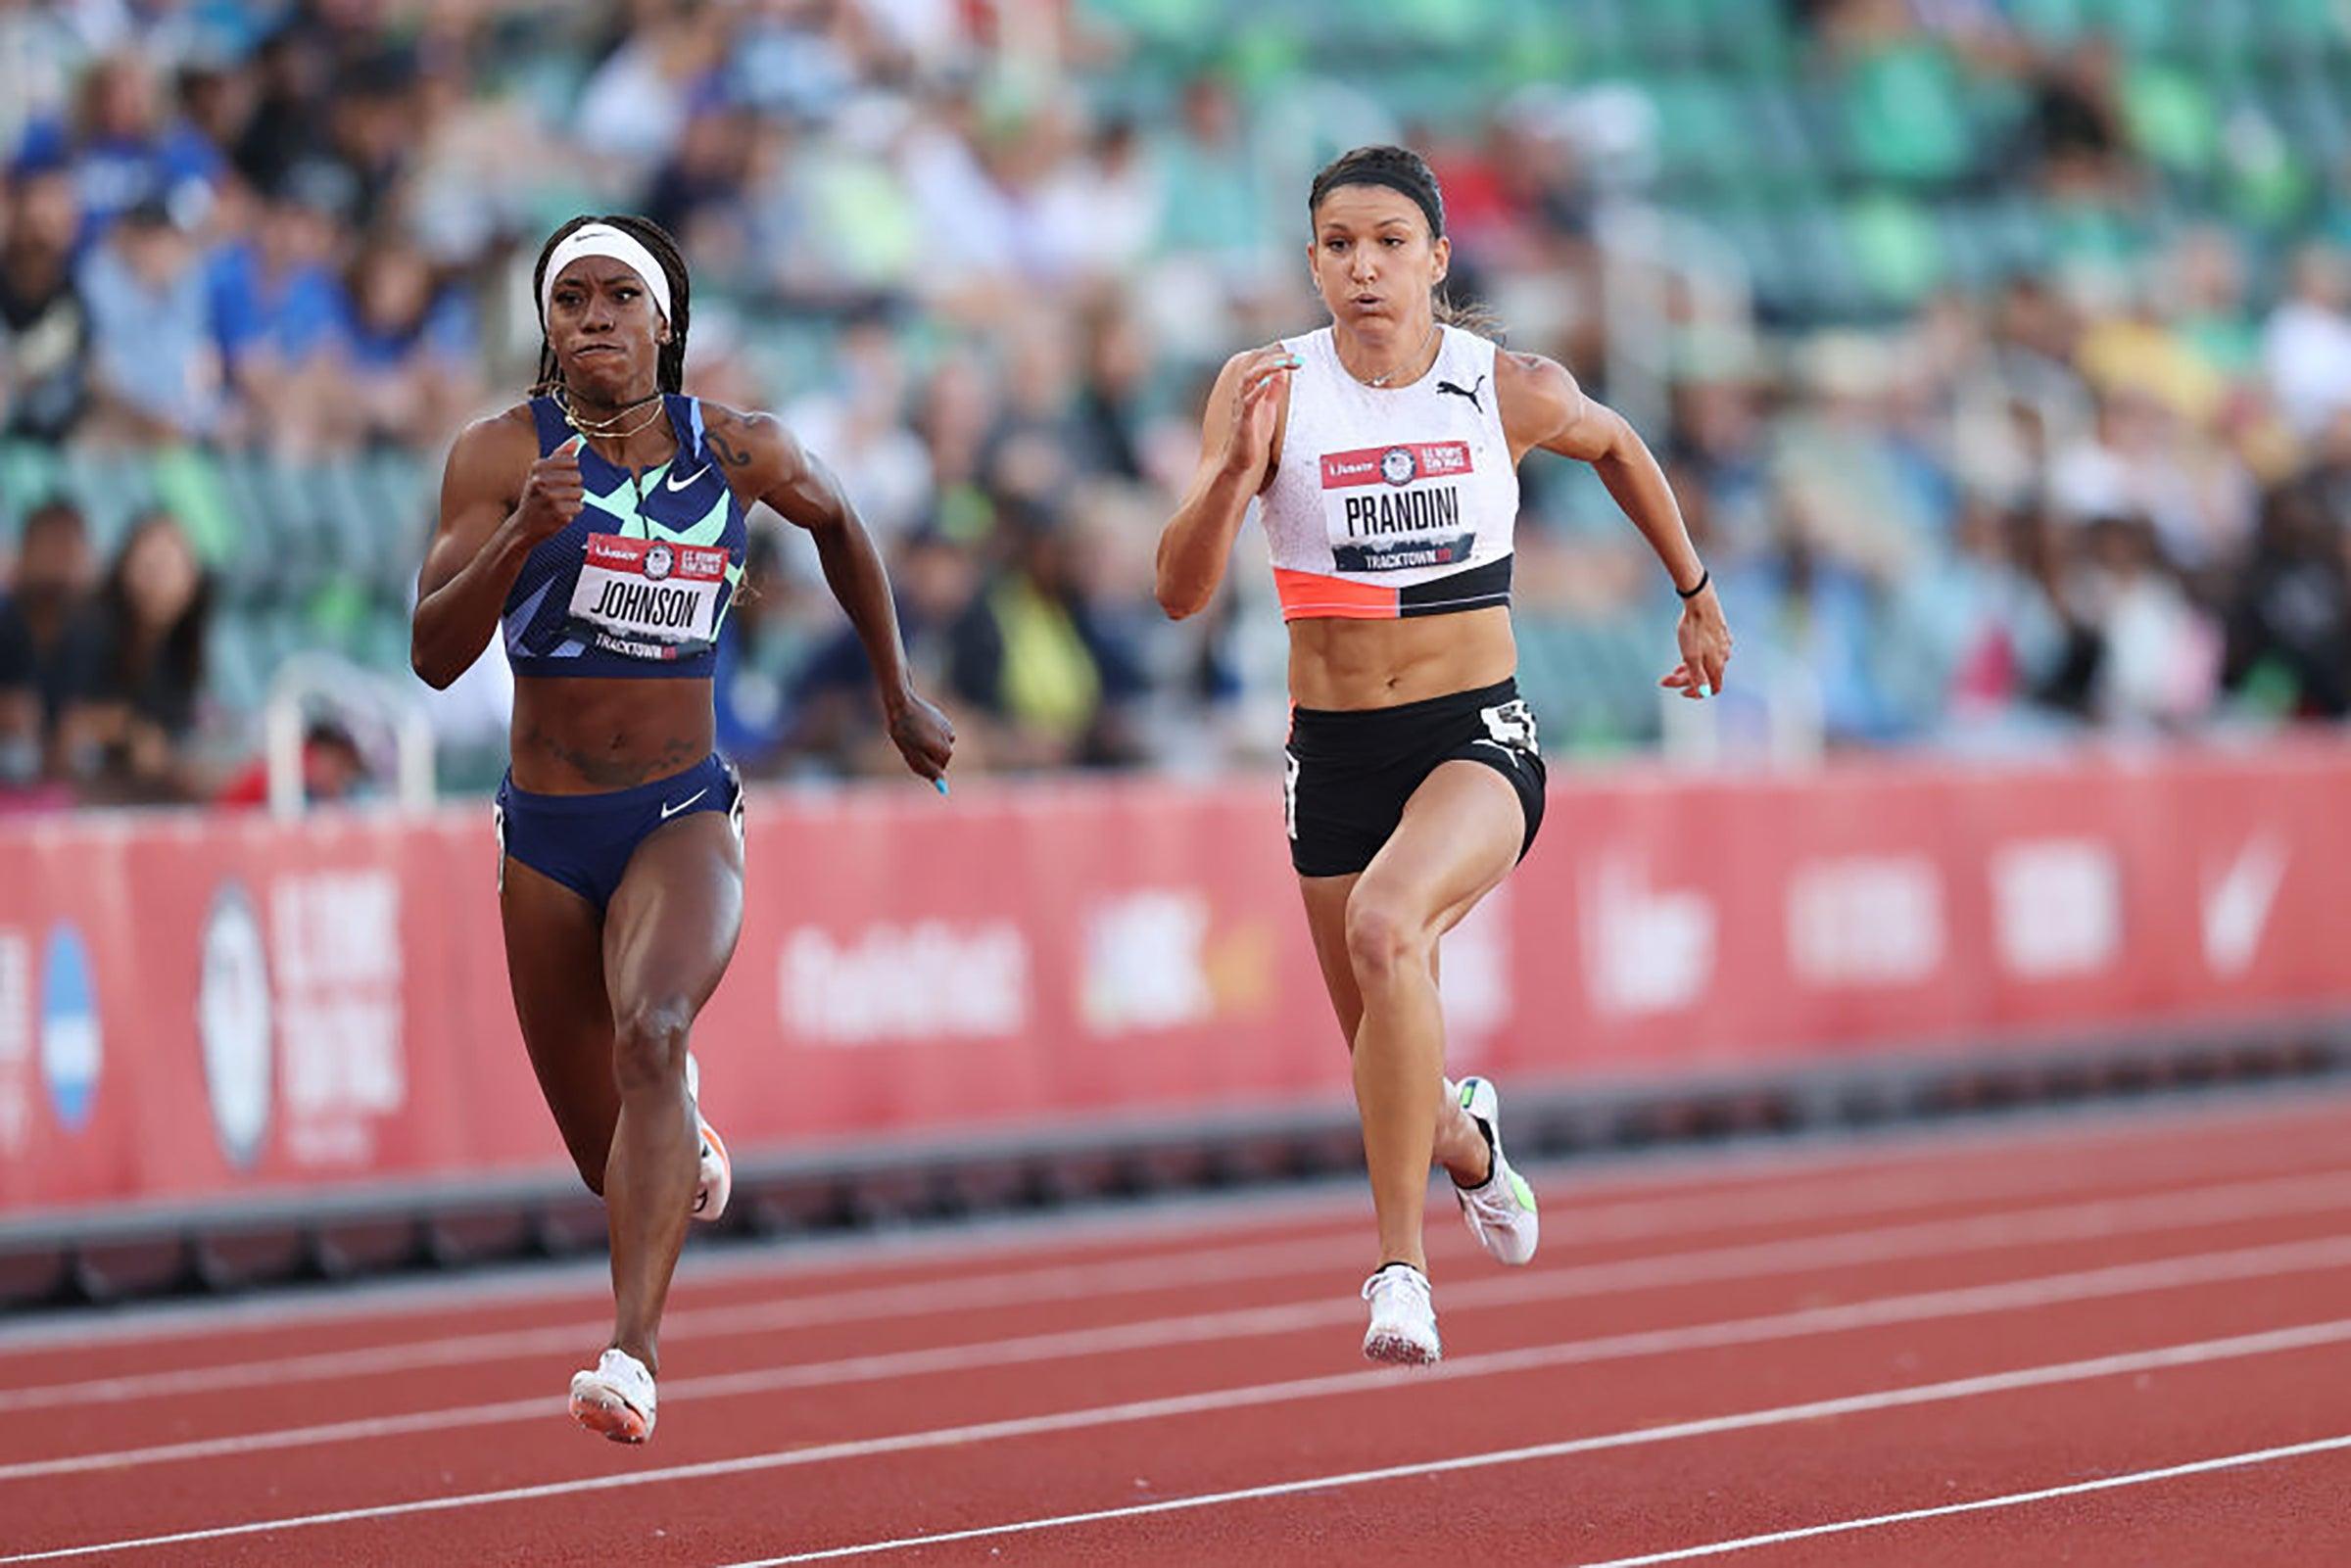 Women's 100m Olympic Trials race